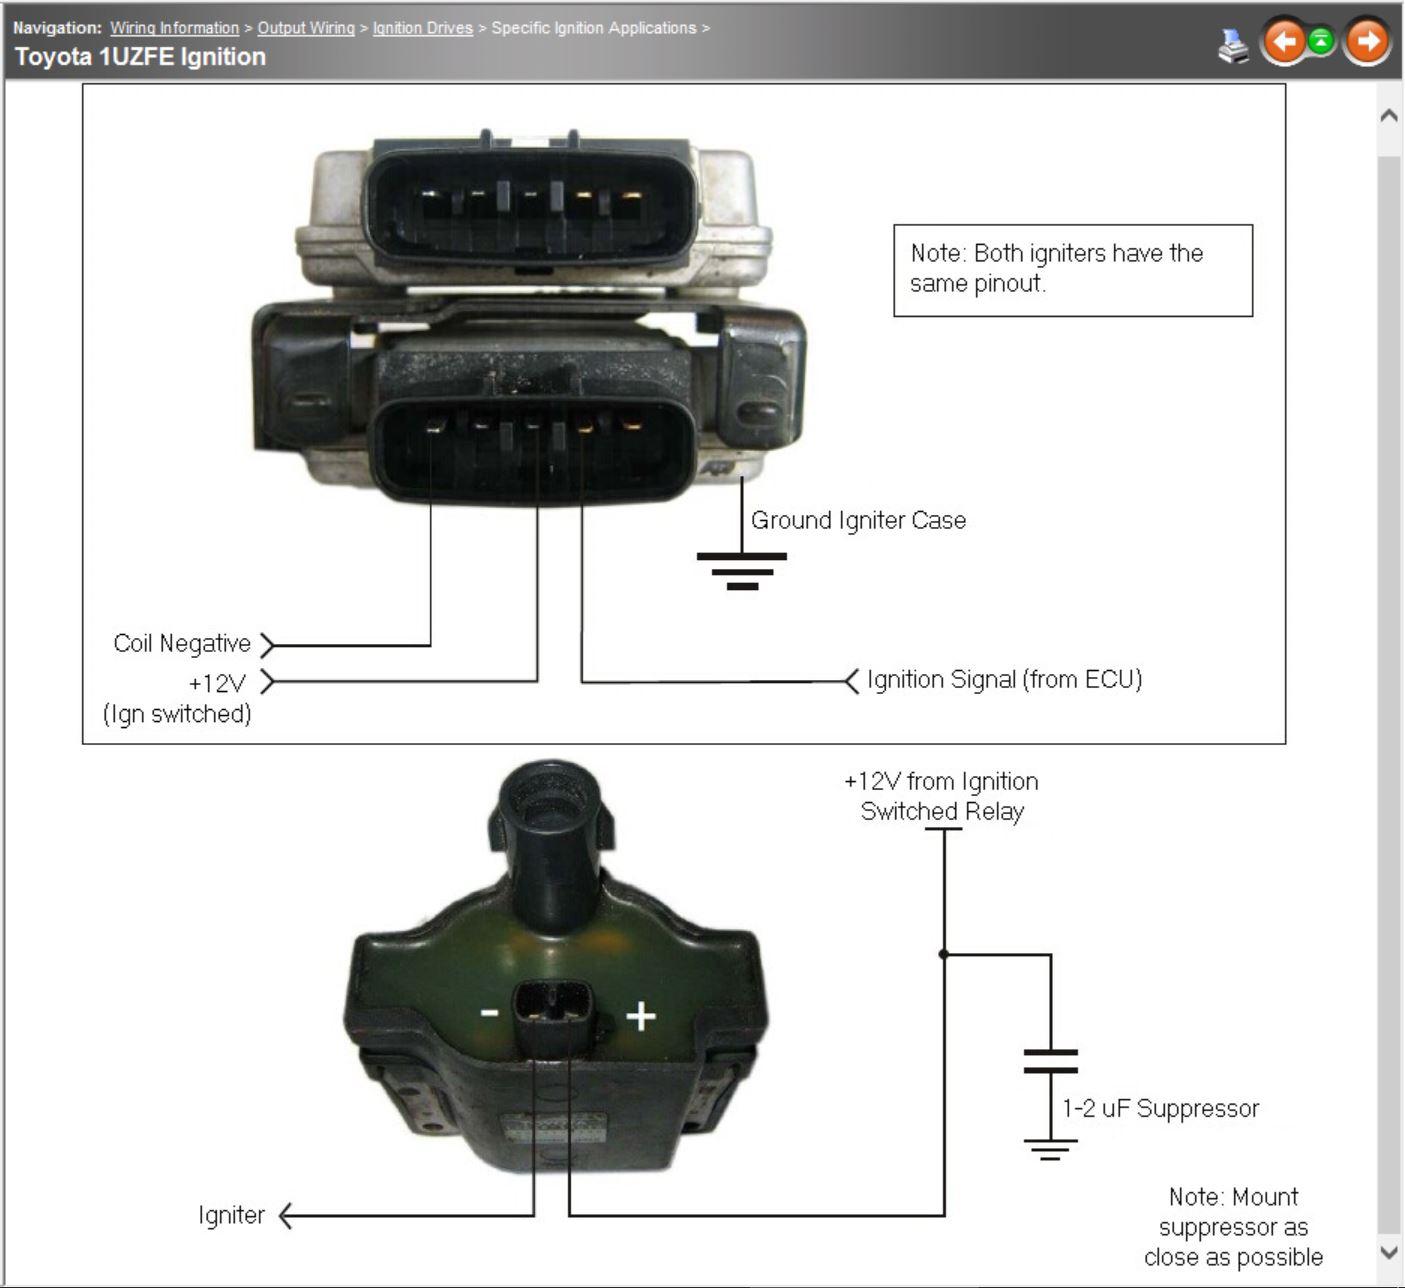 Diagram Wilbo666 1uz Wiring Diagram Full Version Hd Quality Wiring Diagram Qdiagram1 Discountdellapiastrella It